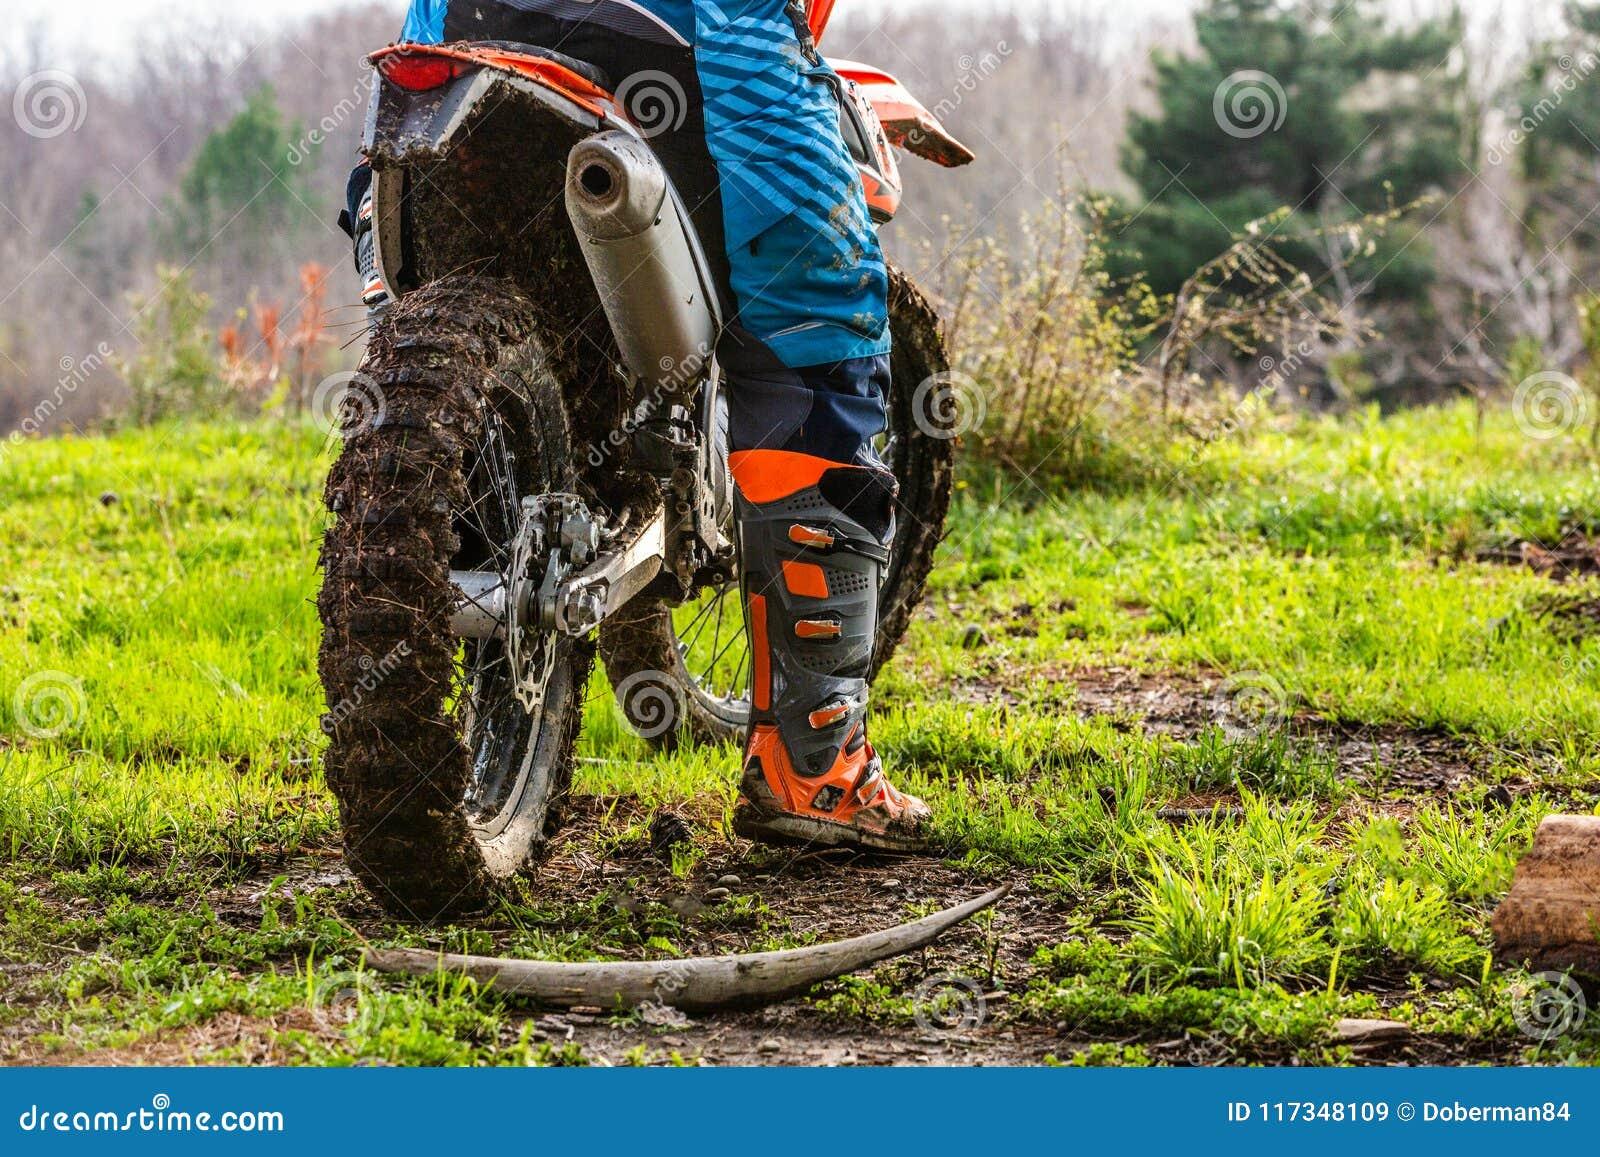 Dirt biker riding on path - Stock Image - F004/2262